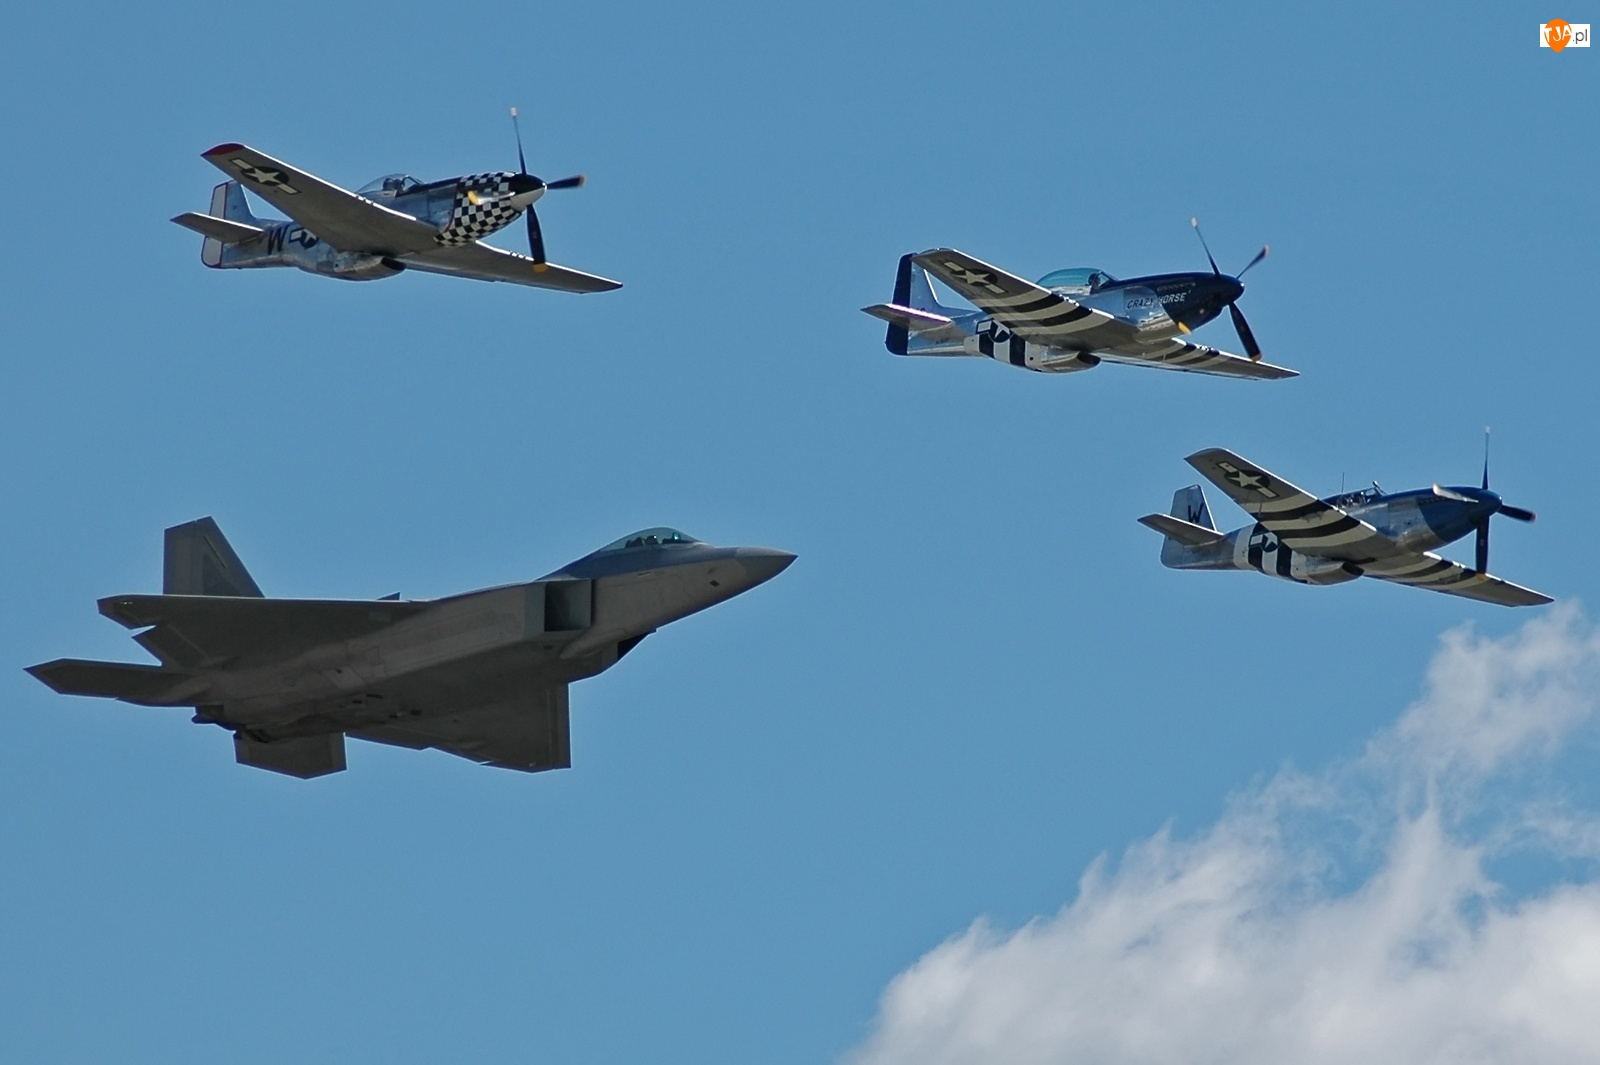 P-51, F-22, trzy